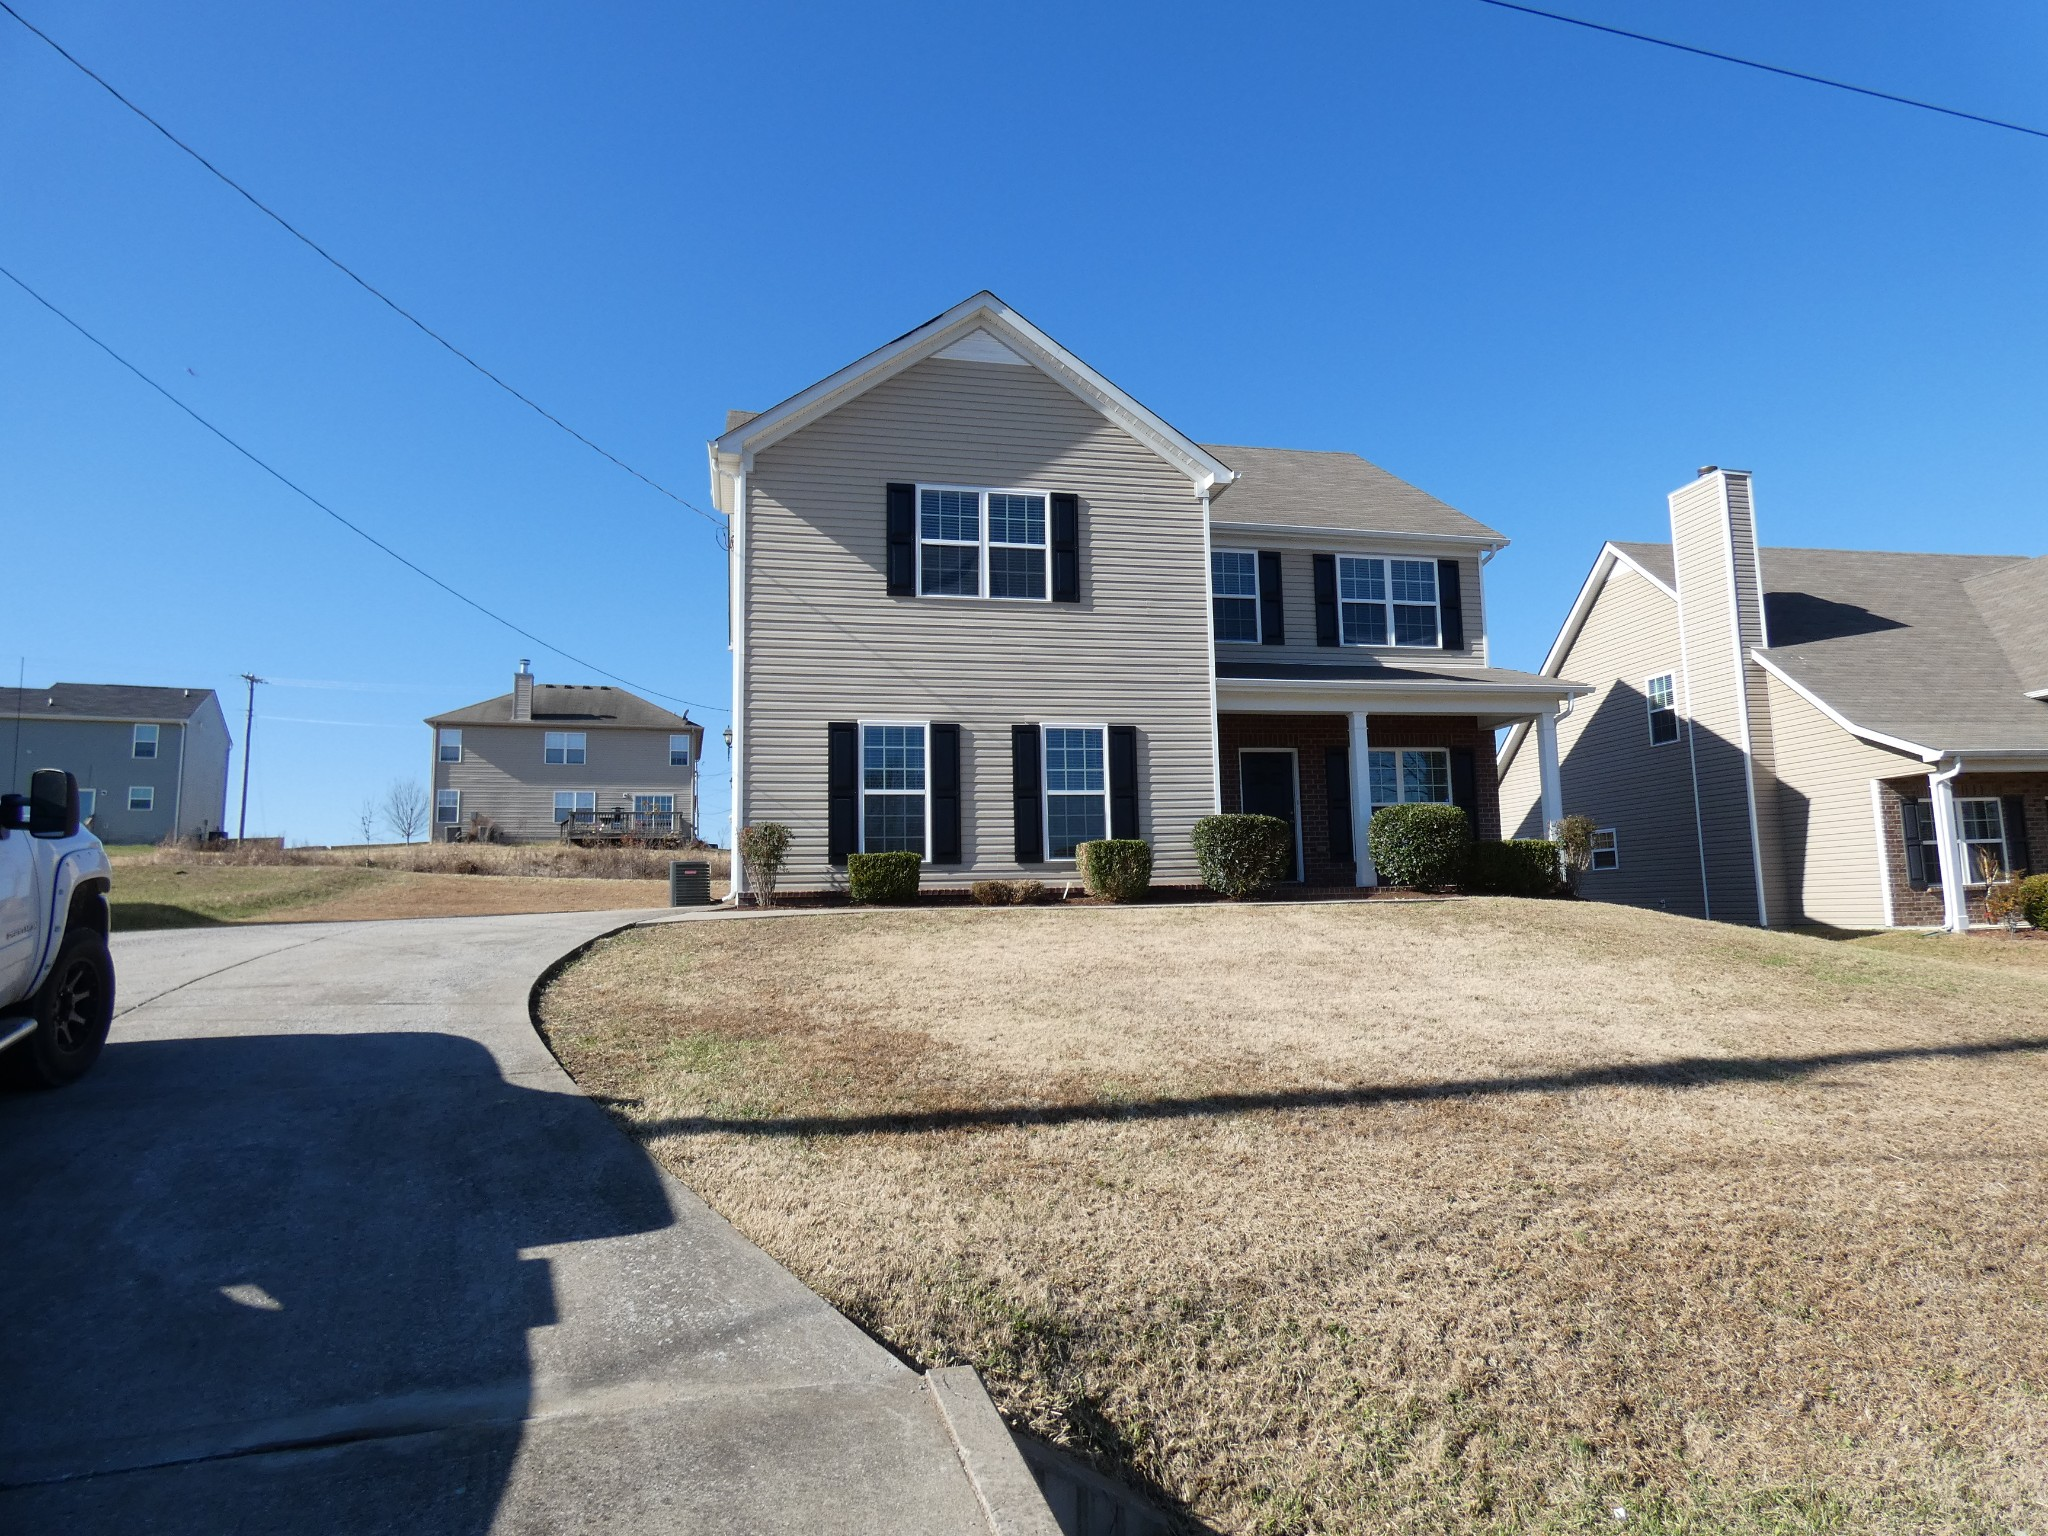 283 Hollandale Rd, LA VERGNE, TN 37086 - LA VERGNE, TN real estate listing